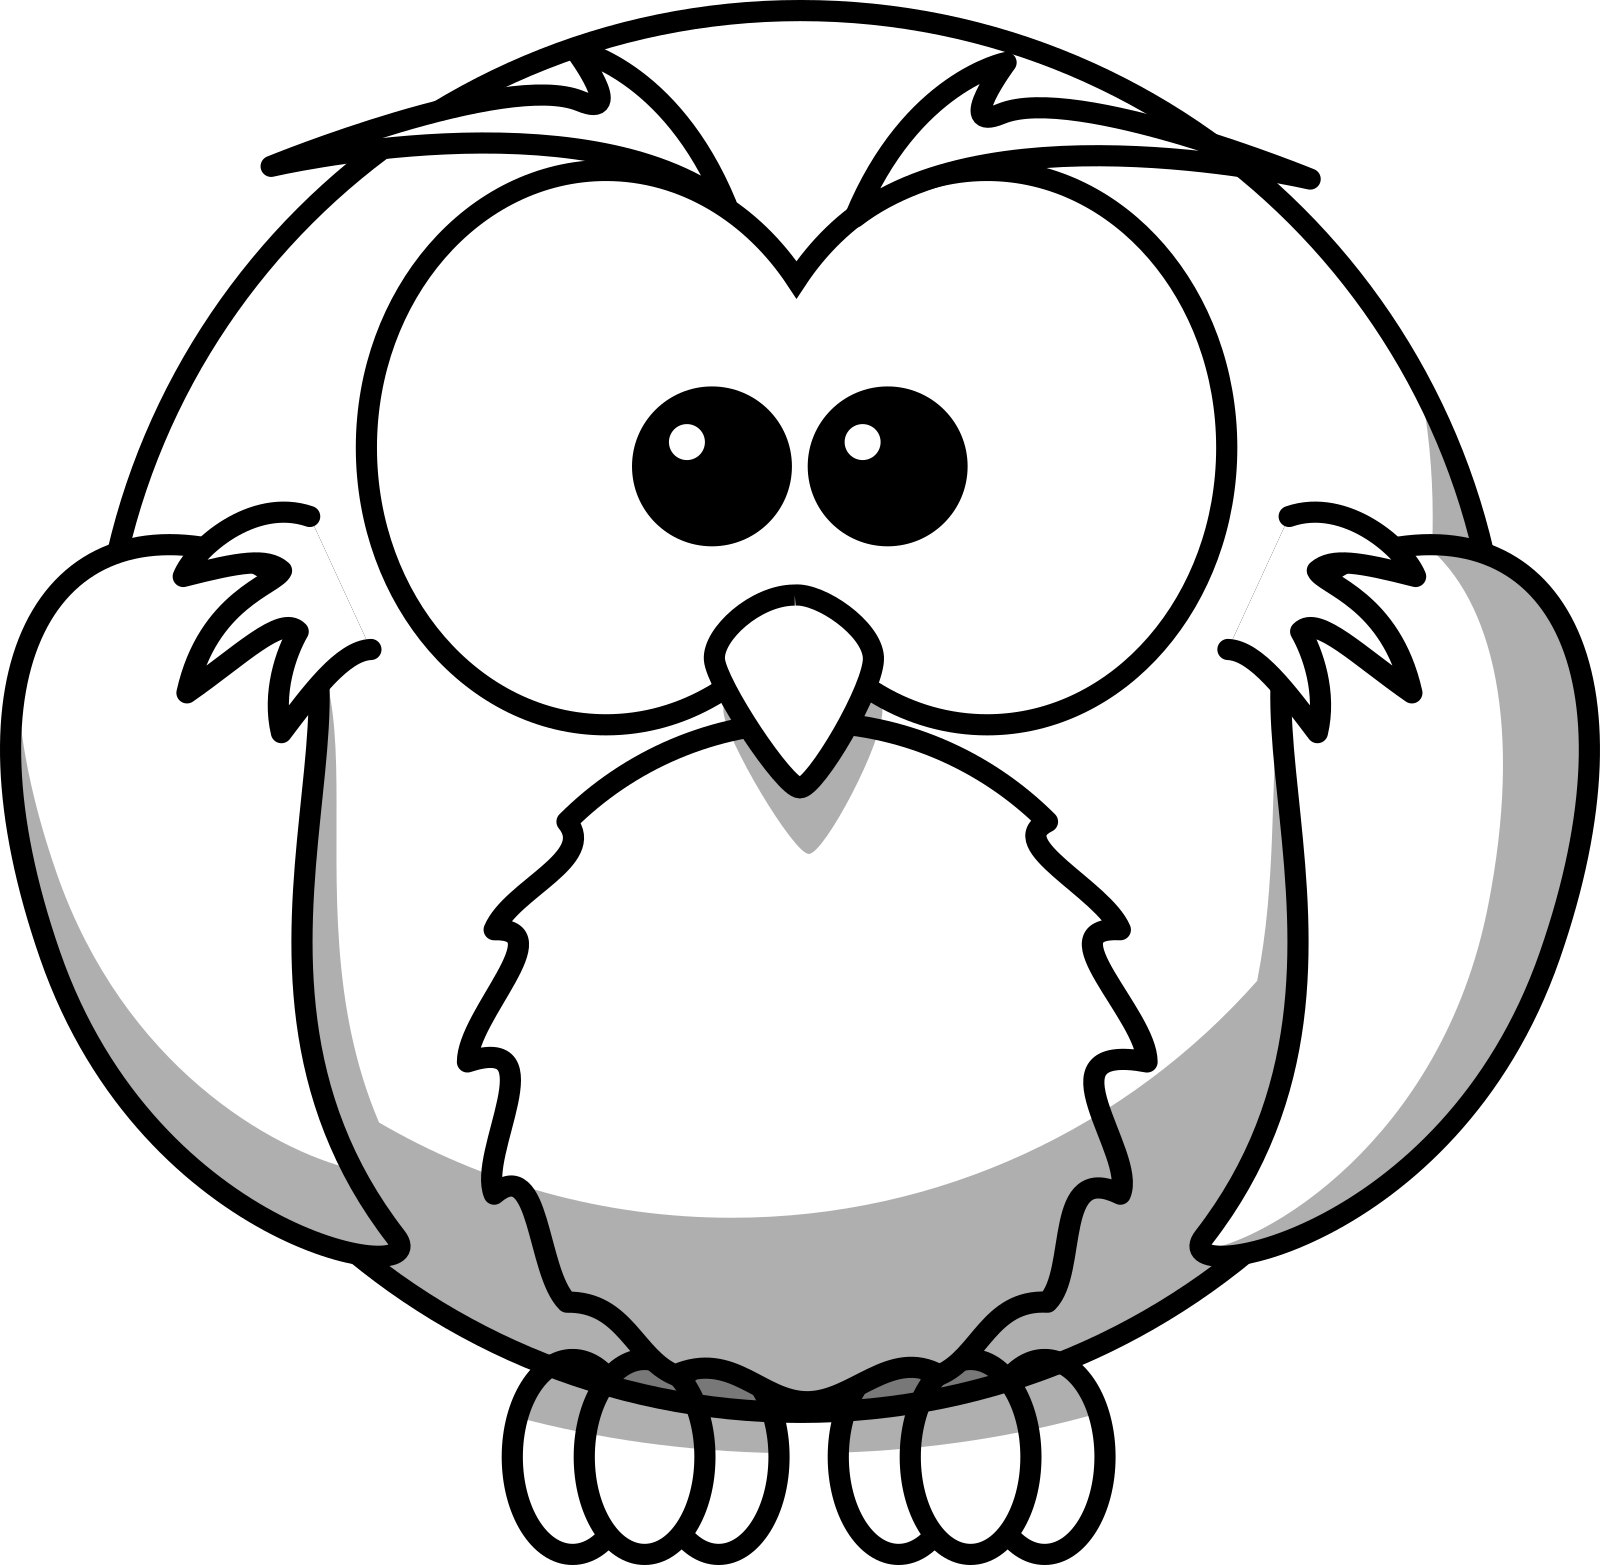 Dreamy Blue Owl SVG Clip arts